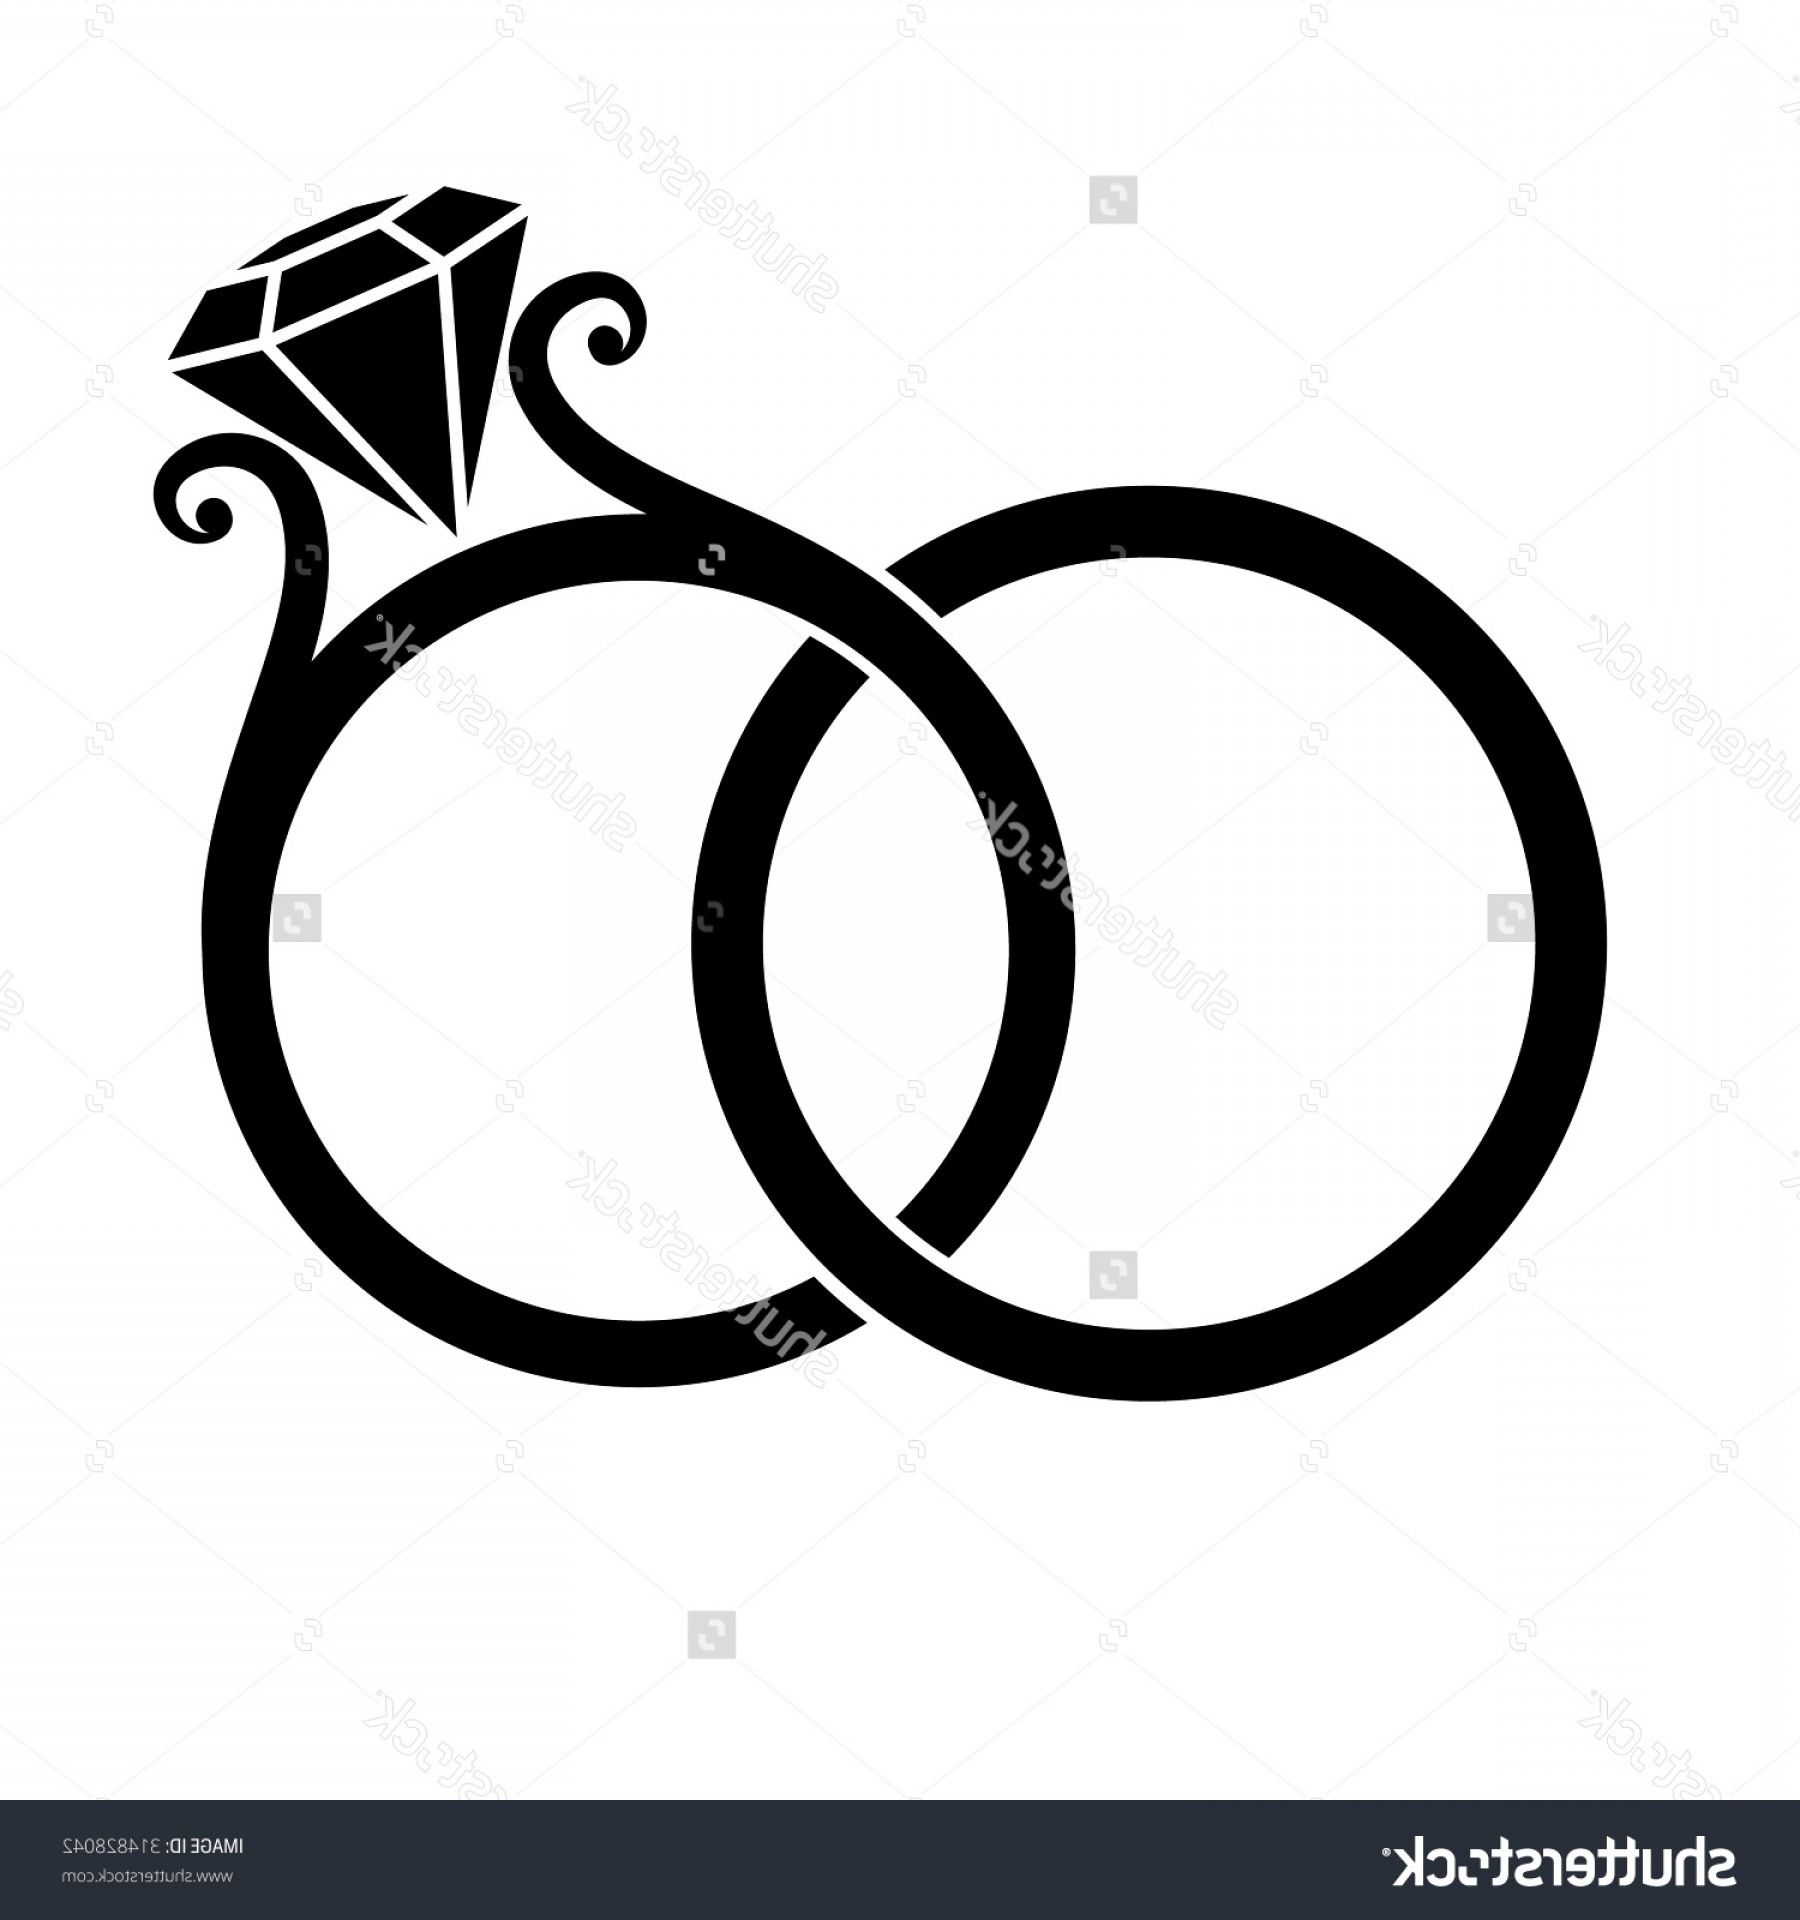 Wedding Clip Art Vector Graphics Bride And Groom Silhouette Wedding Clipart Wedding Ring Clipart Bride And Groom Silhouette Wedding Silhouette